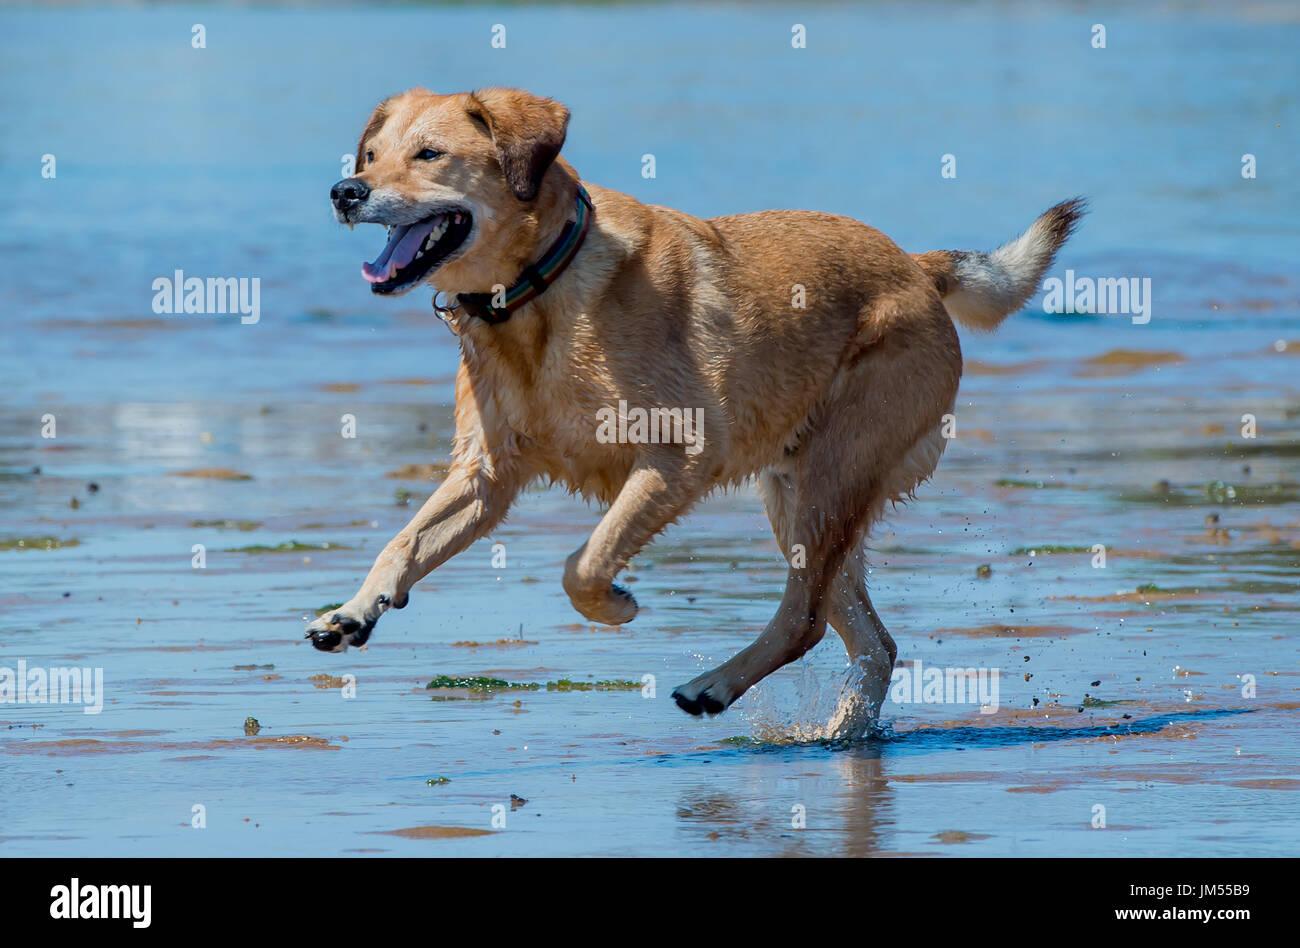 Lab Mix Dog Stock Photos & Lab Mix Dog Stock Images - Alamy